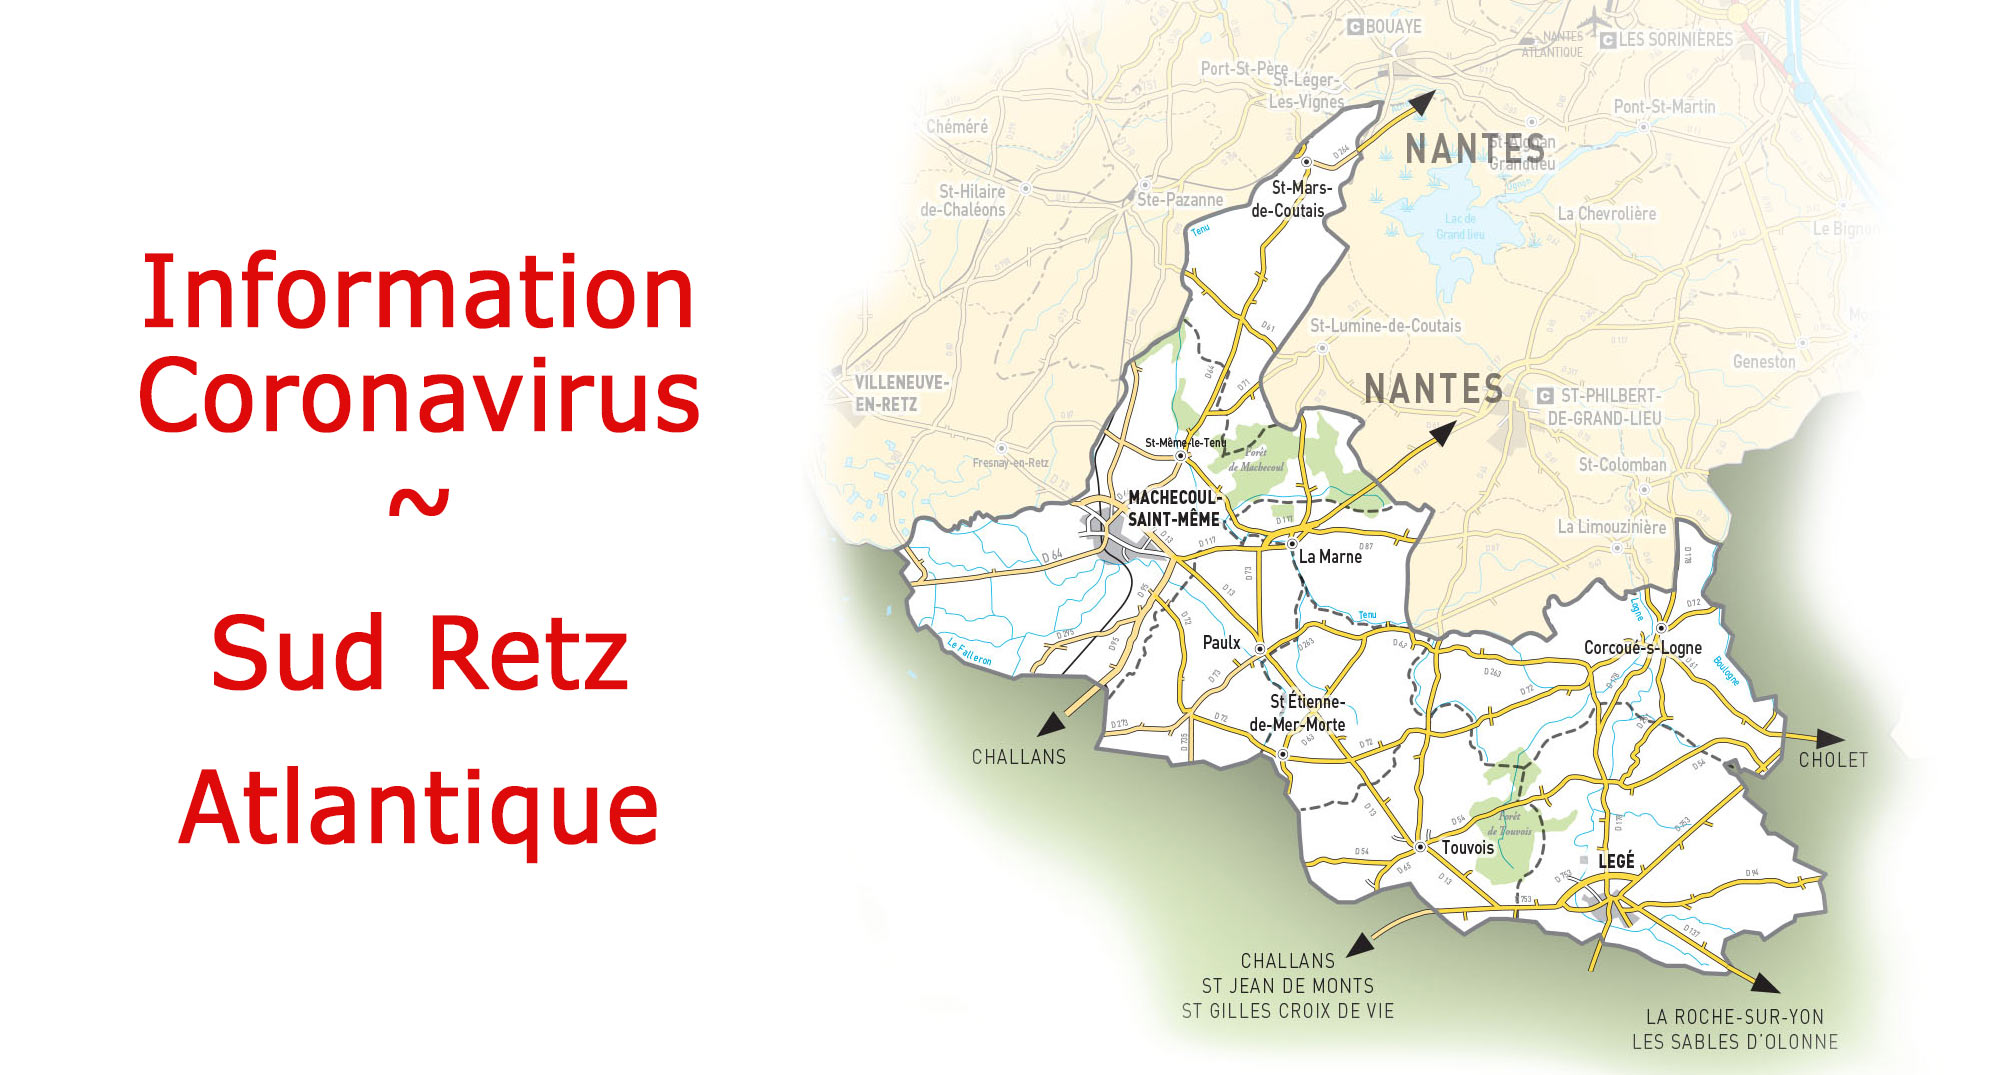 Information Coronavirus Sud Retz Atlantique